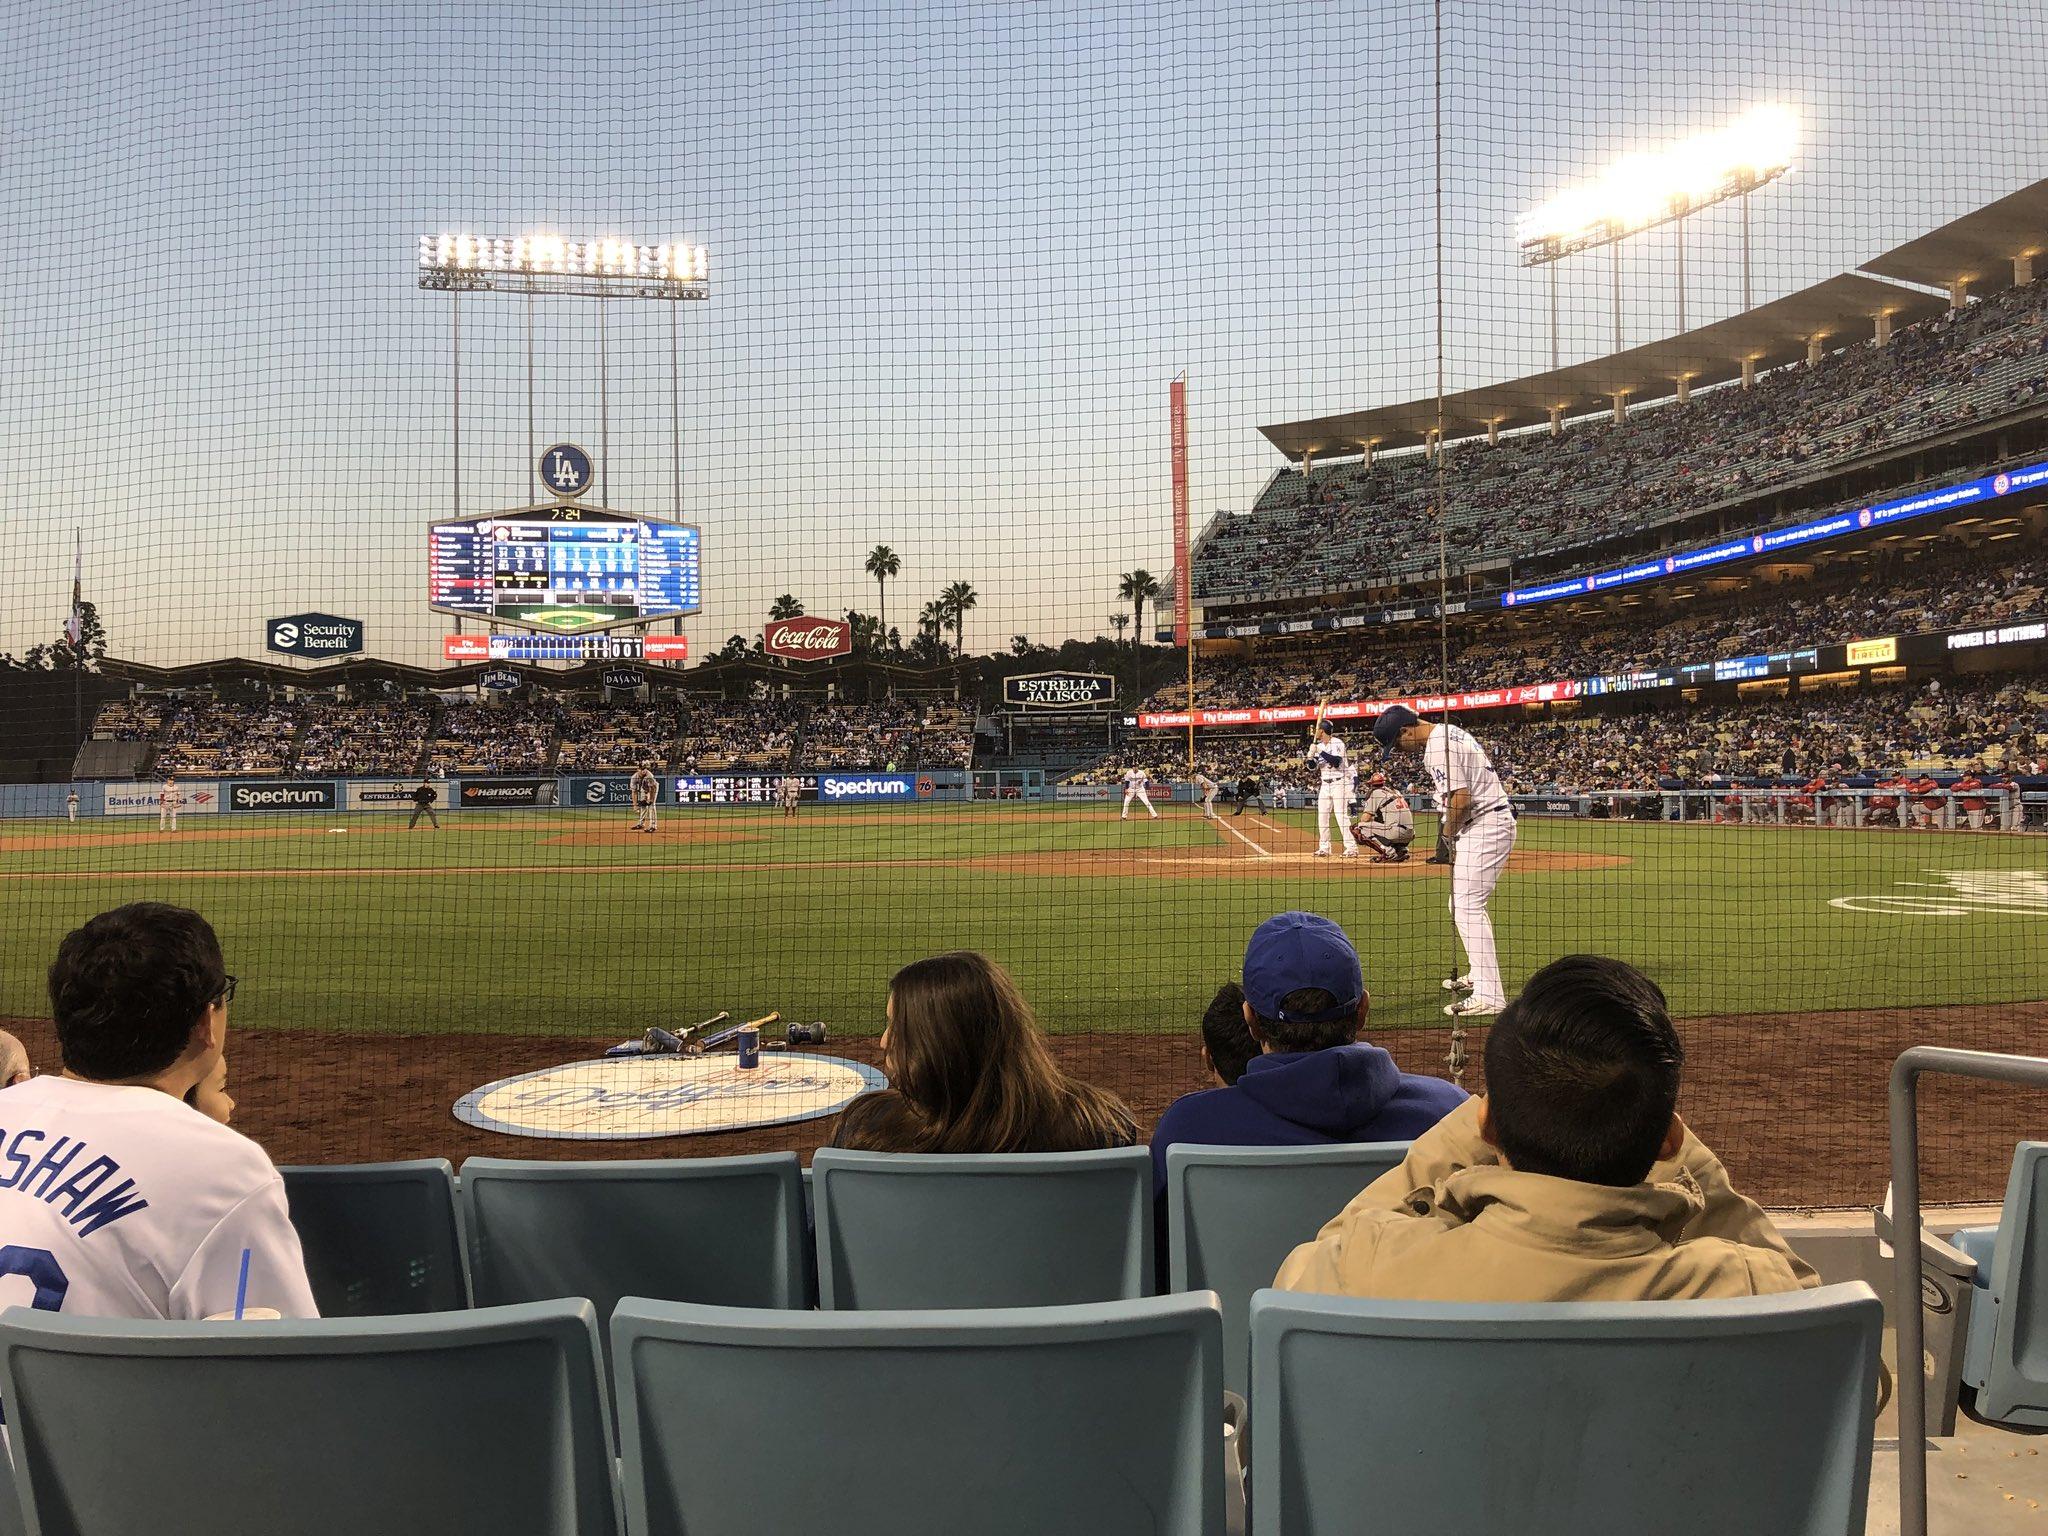 I'm at da baseball game! https://t.co/4bq7QvY1Qw